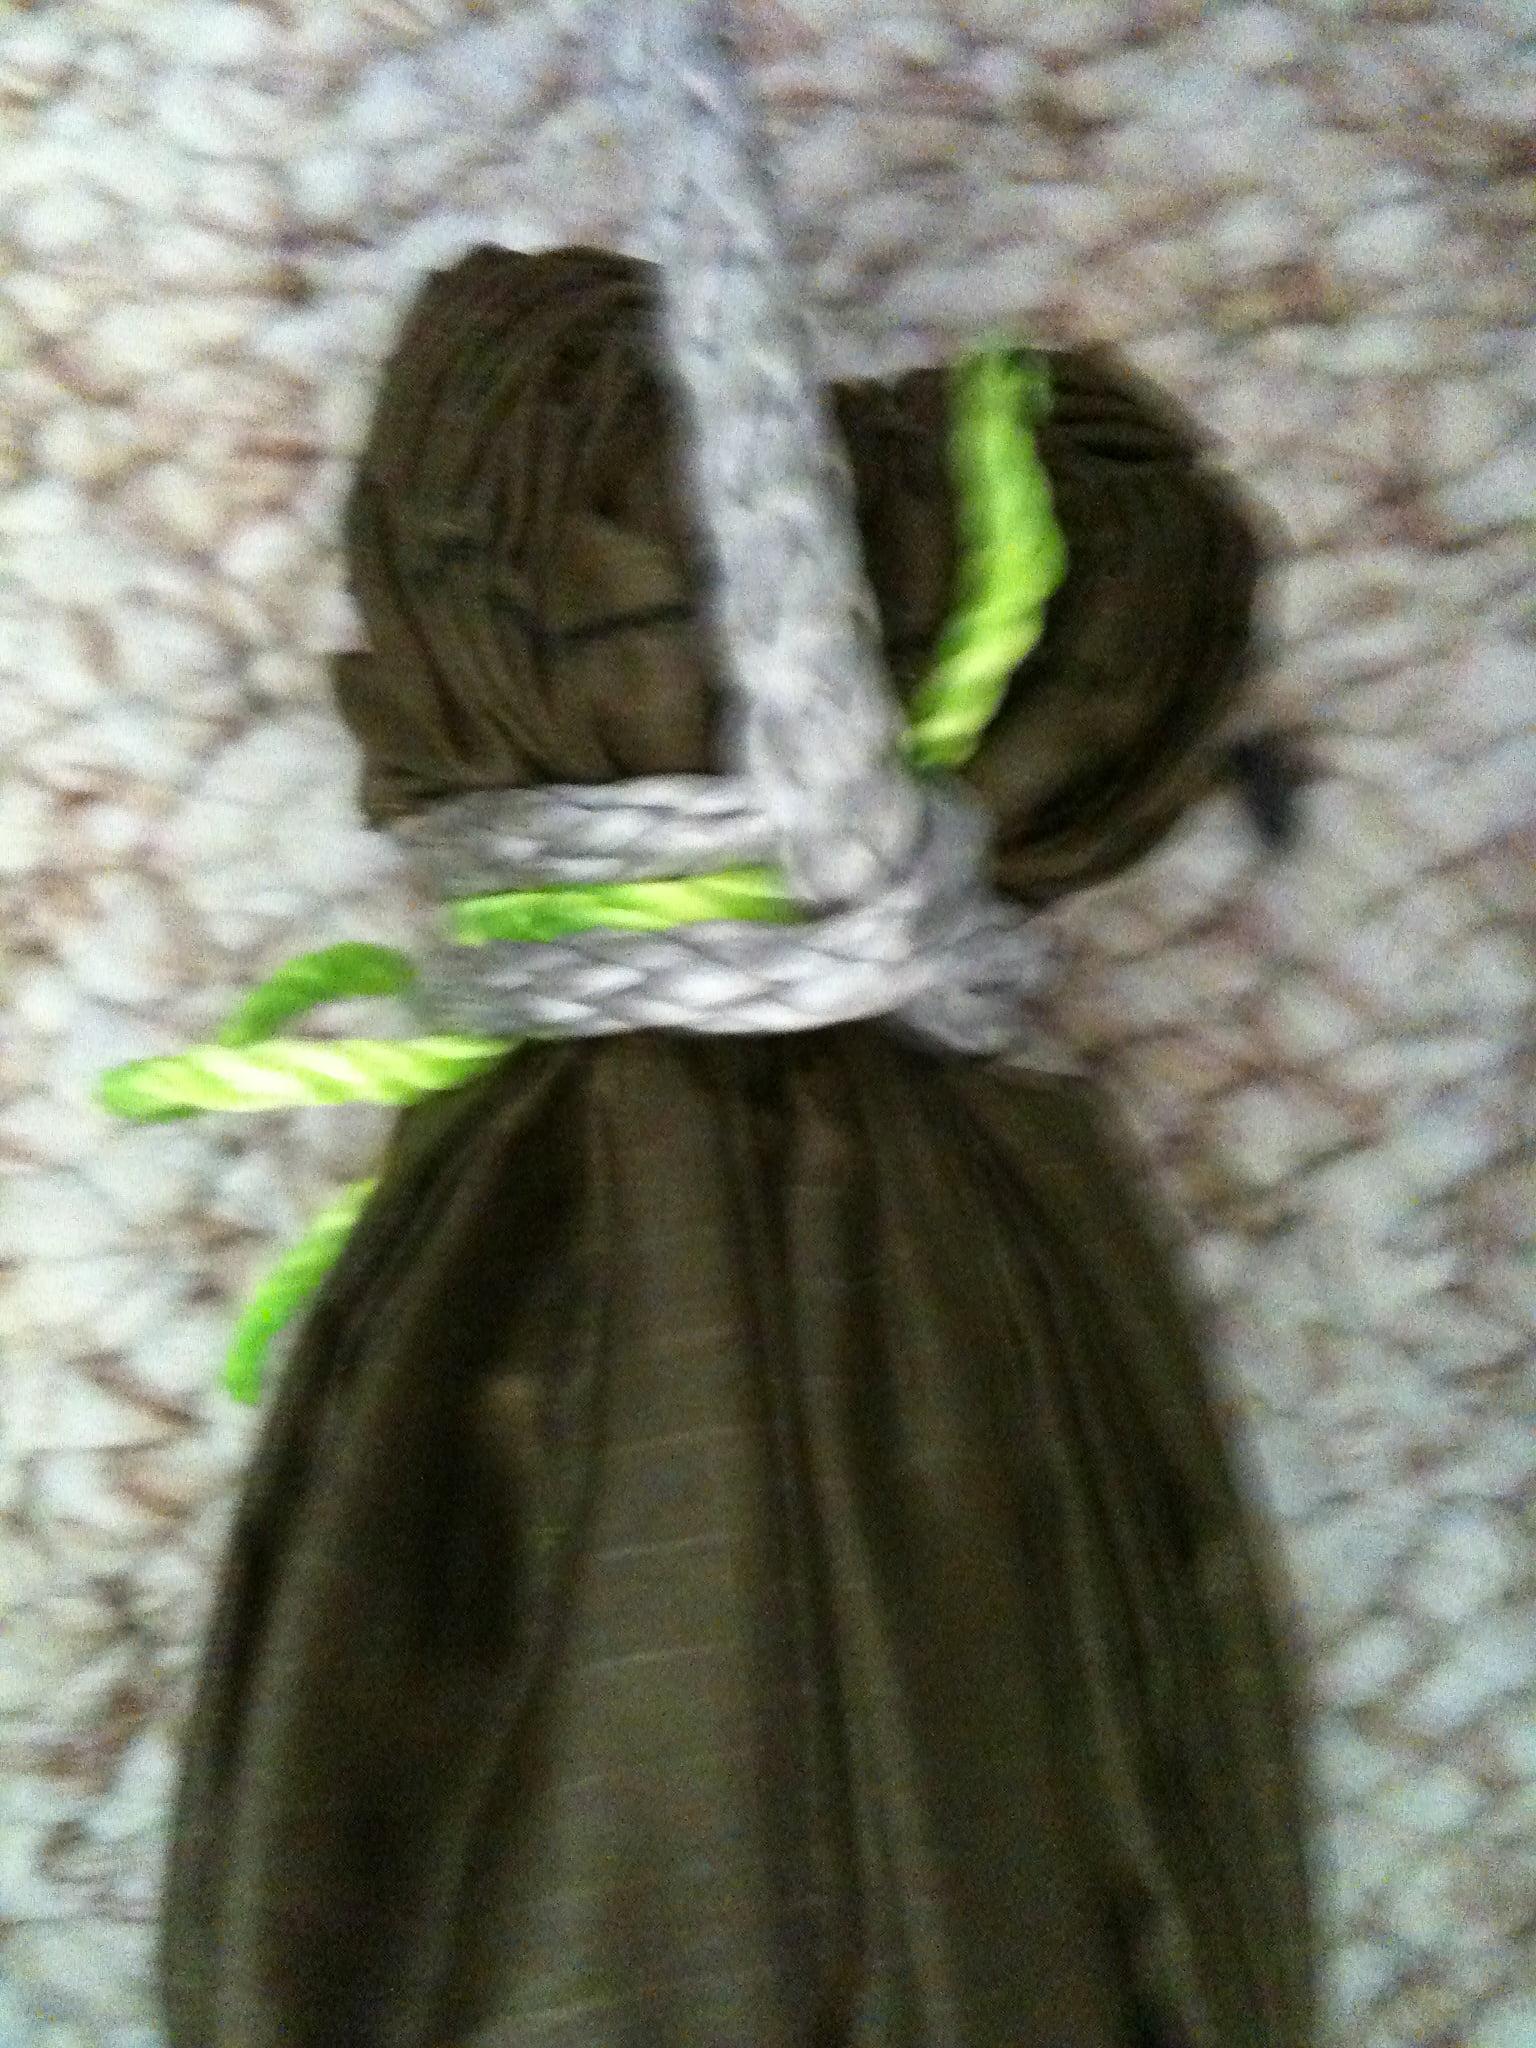 100 14 Diy Hammocks And Hanging How To Make A Drop Cloth